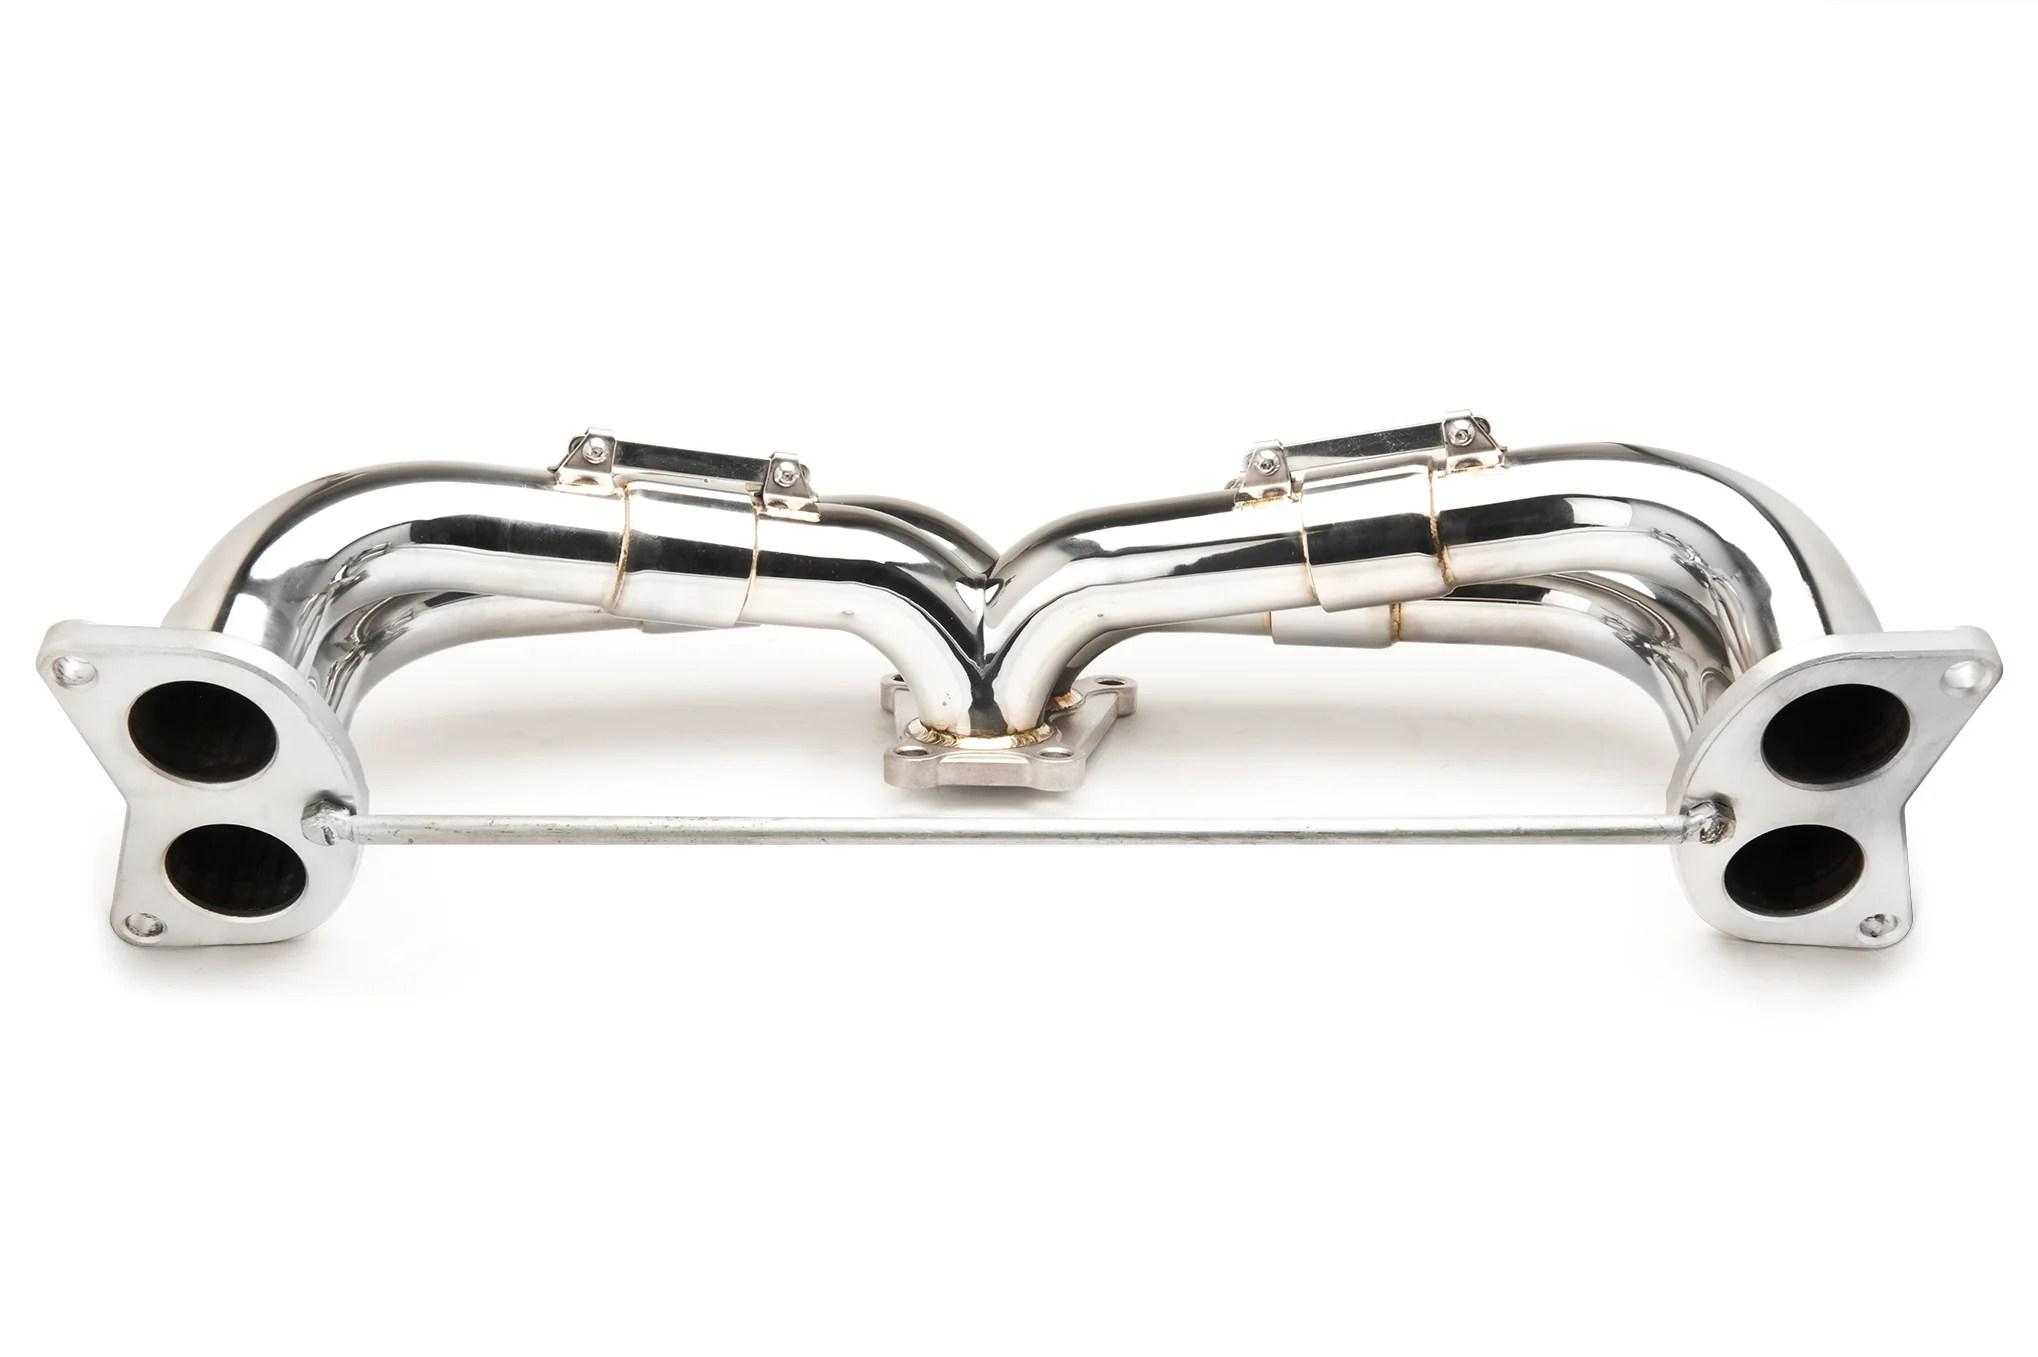 https www tomiokaracing com products tr exhaust manifold for 2015 subaru wrx fa20dit